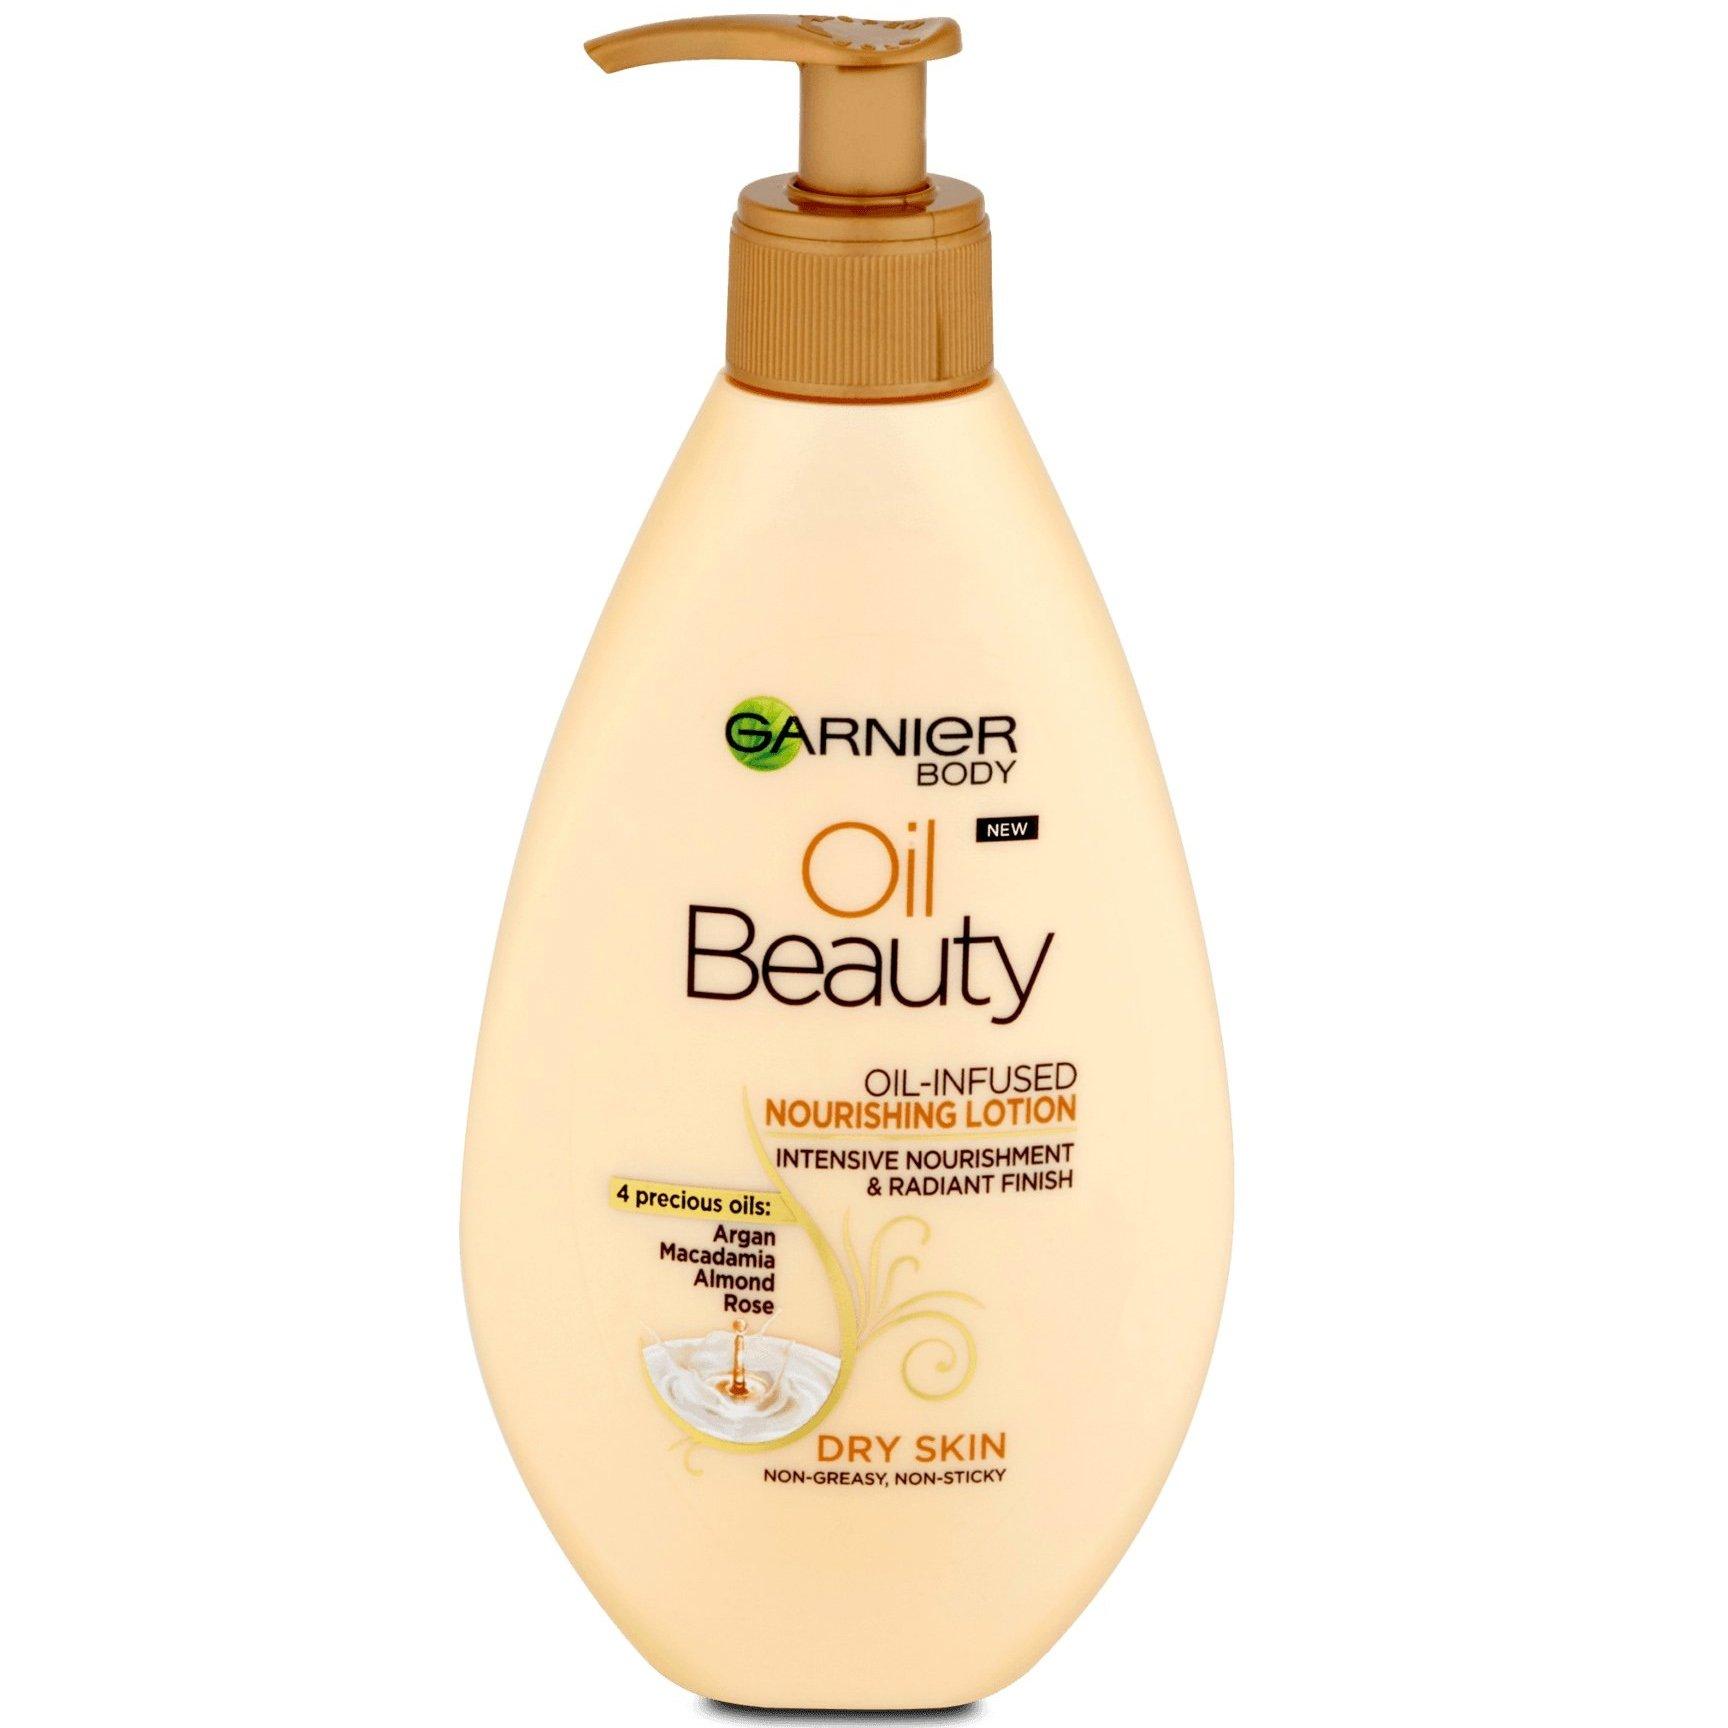 Garnier Body Oil BeautyΘρεπτική Λοσιόν Σώματος με 4 Πολύτιμα Έλαια 250ml